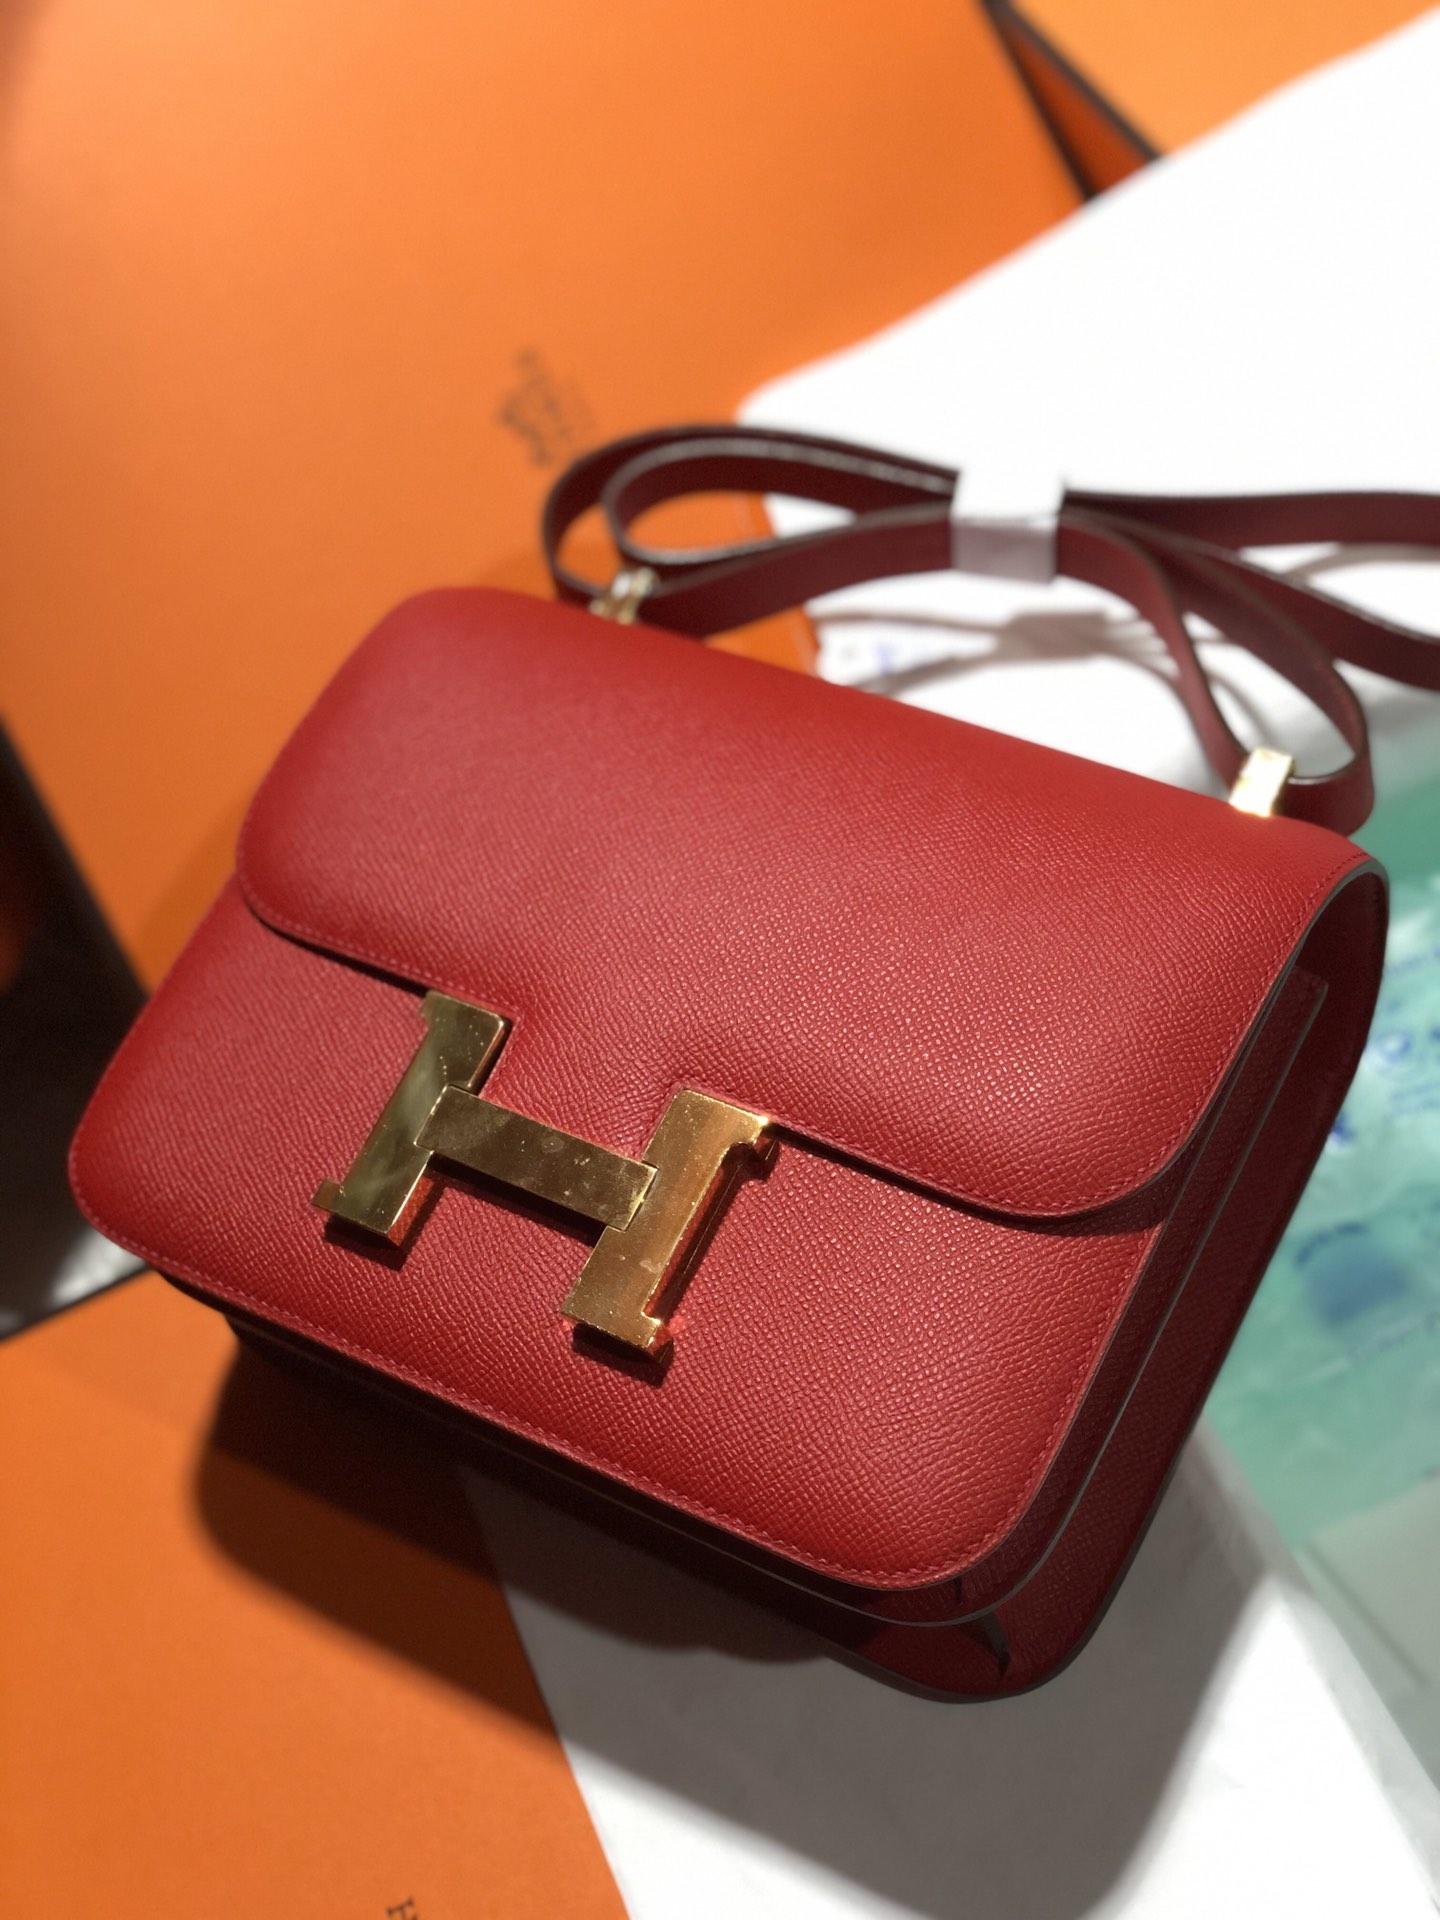 Discount Hermes Q5 Rouge Casaque Epsom Calf Constance24cm Bag Gold Hardware